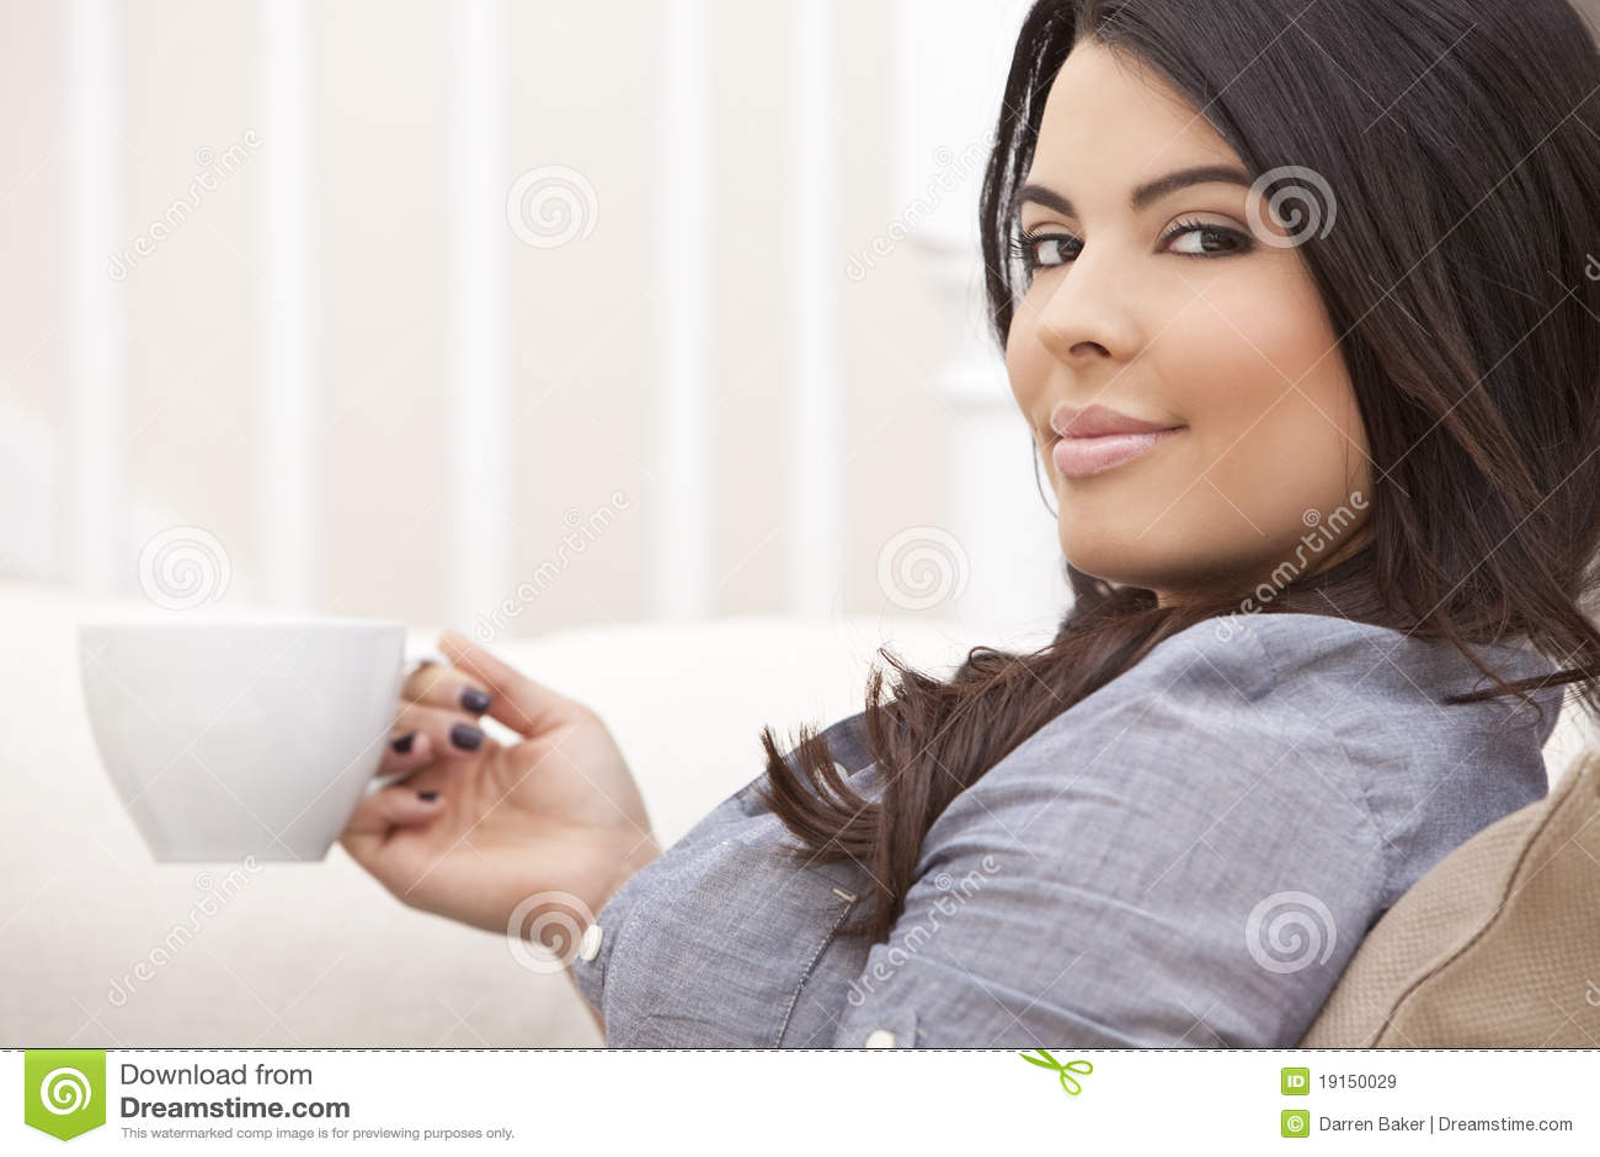 tea hispanic single women Free to join & browse - 1000's of latino women - interracial dating for men & women - black, white, latino, asian, everyone.